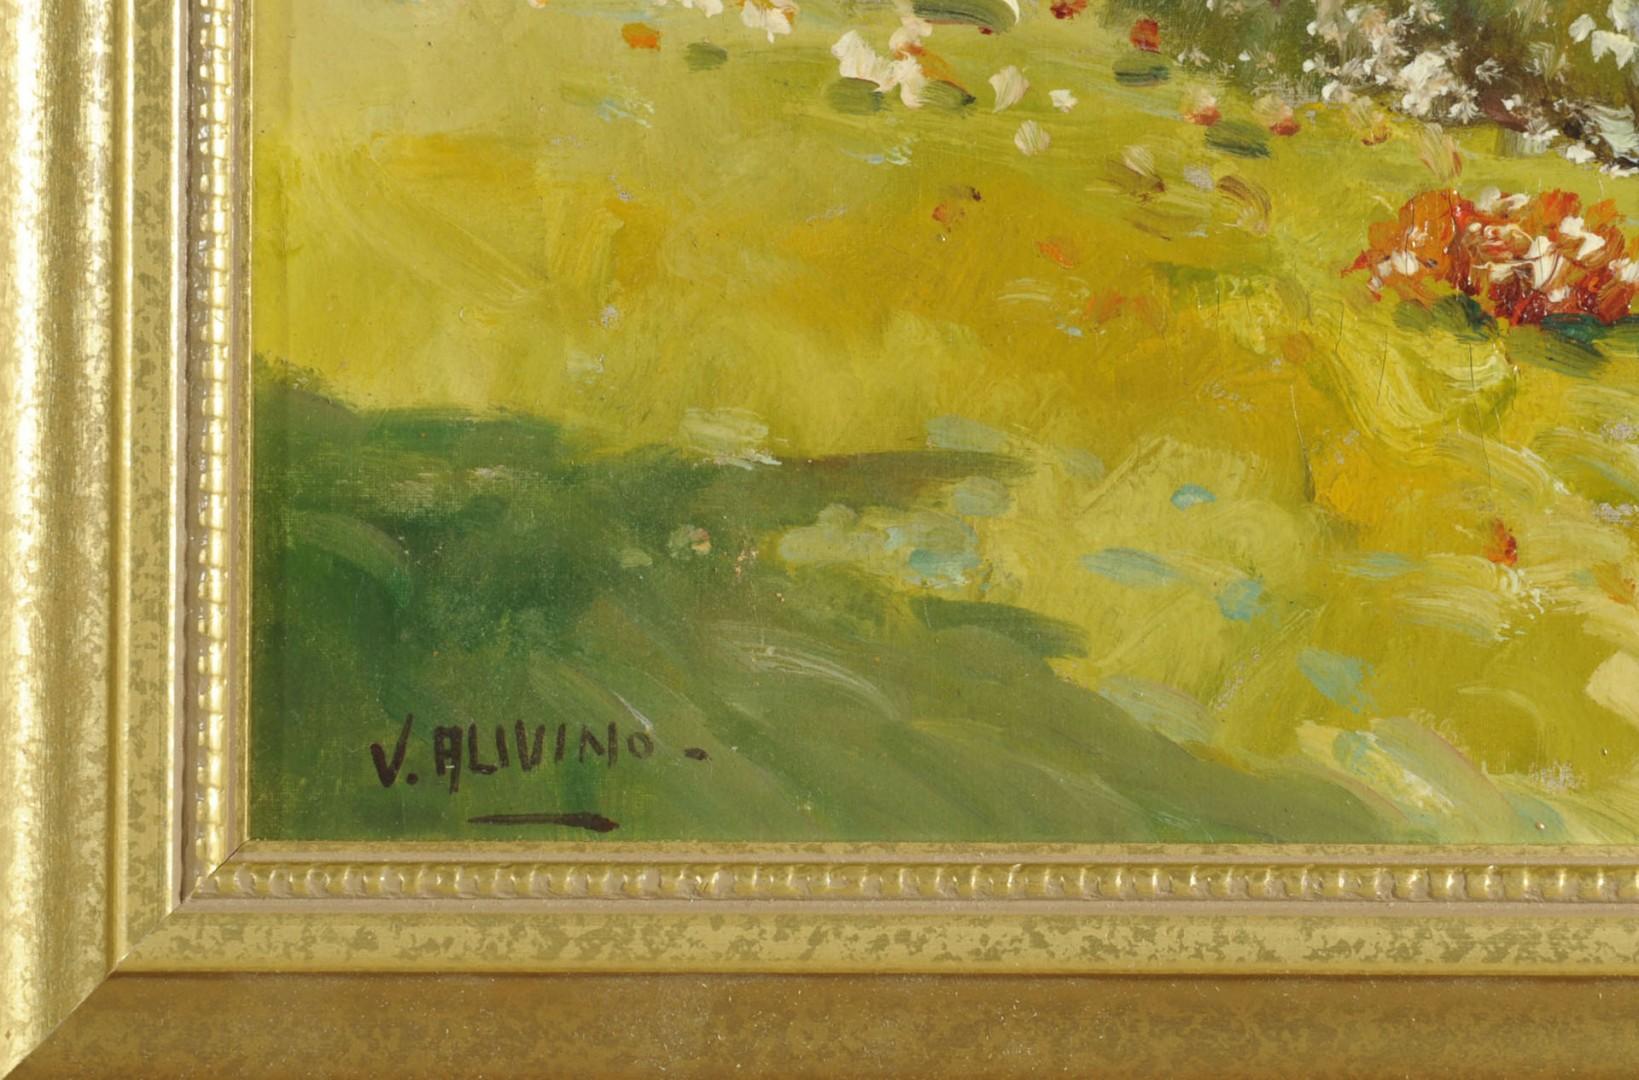 Italian School V. Alivino Oil on Board